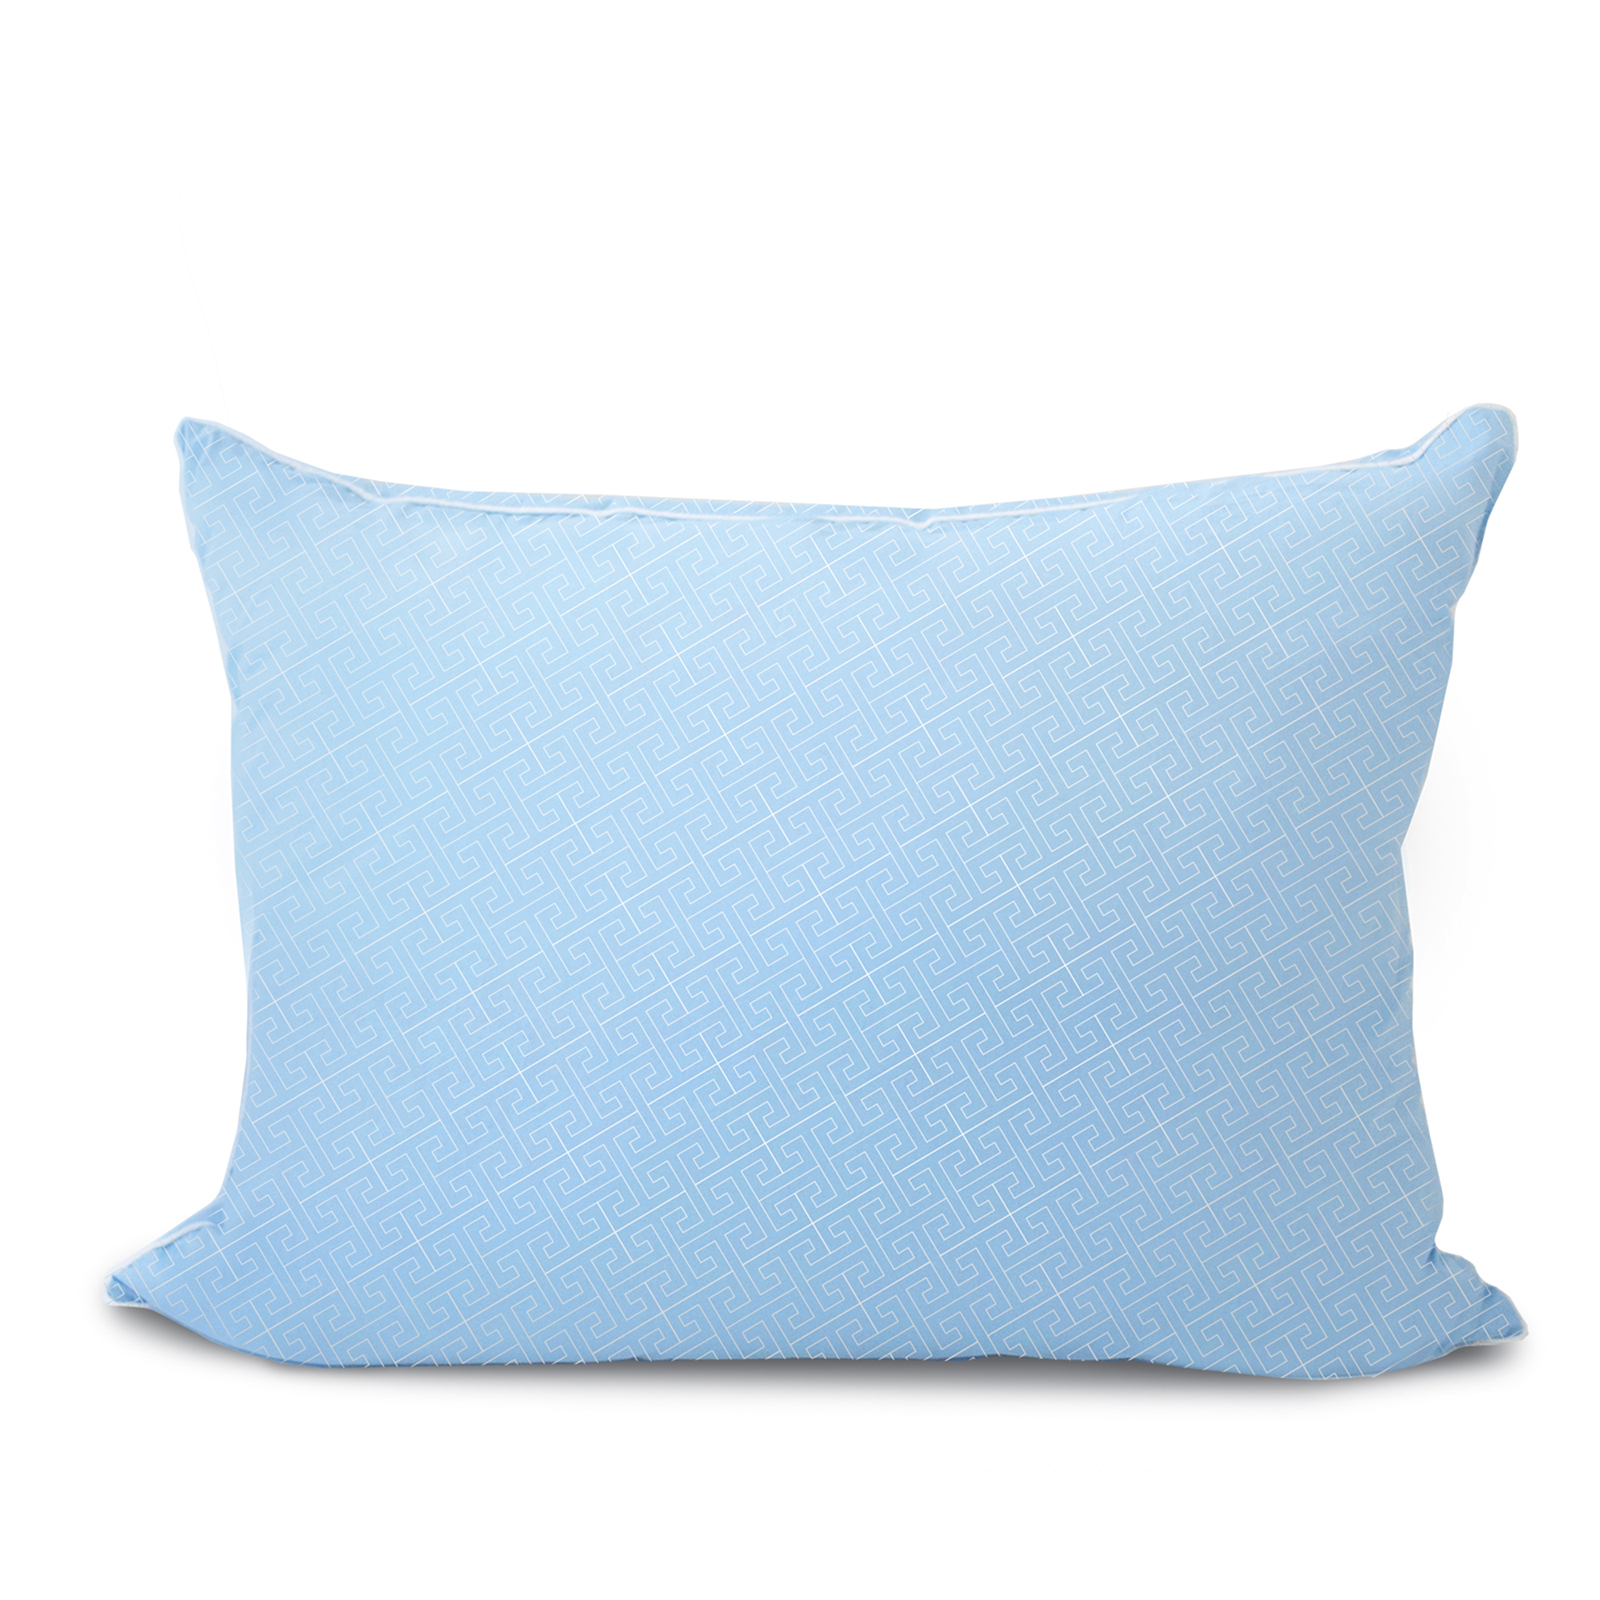 Подушка Kariguz 50x68 см